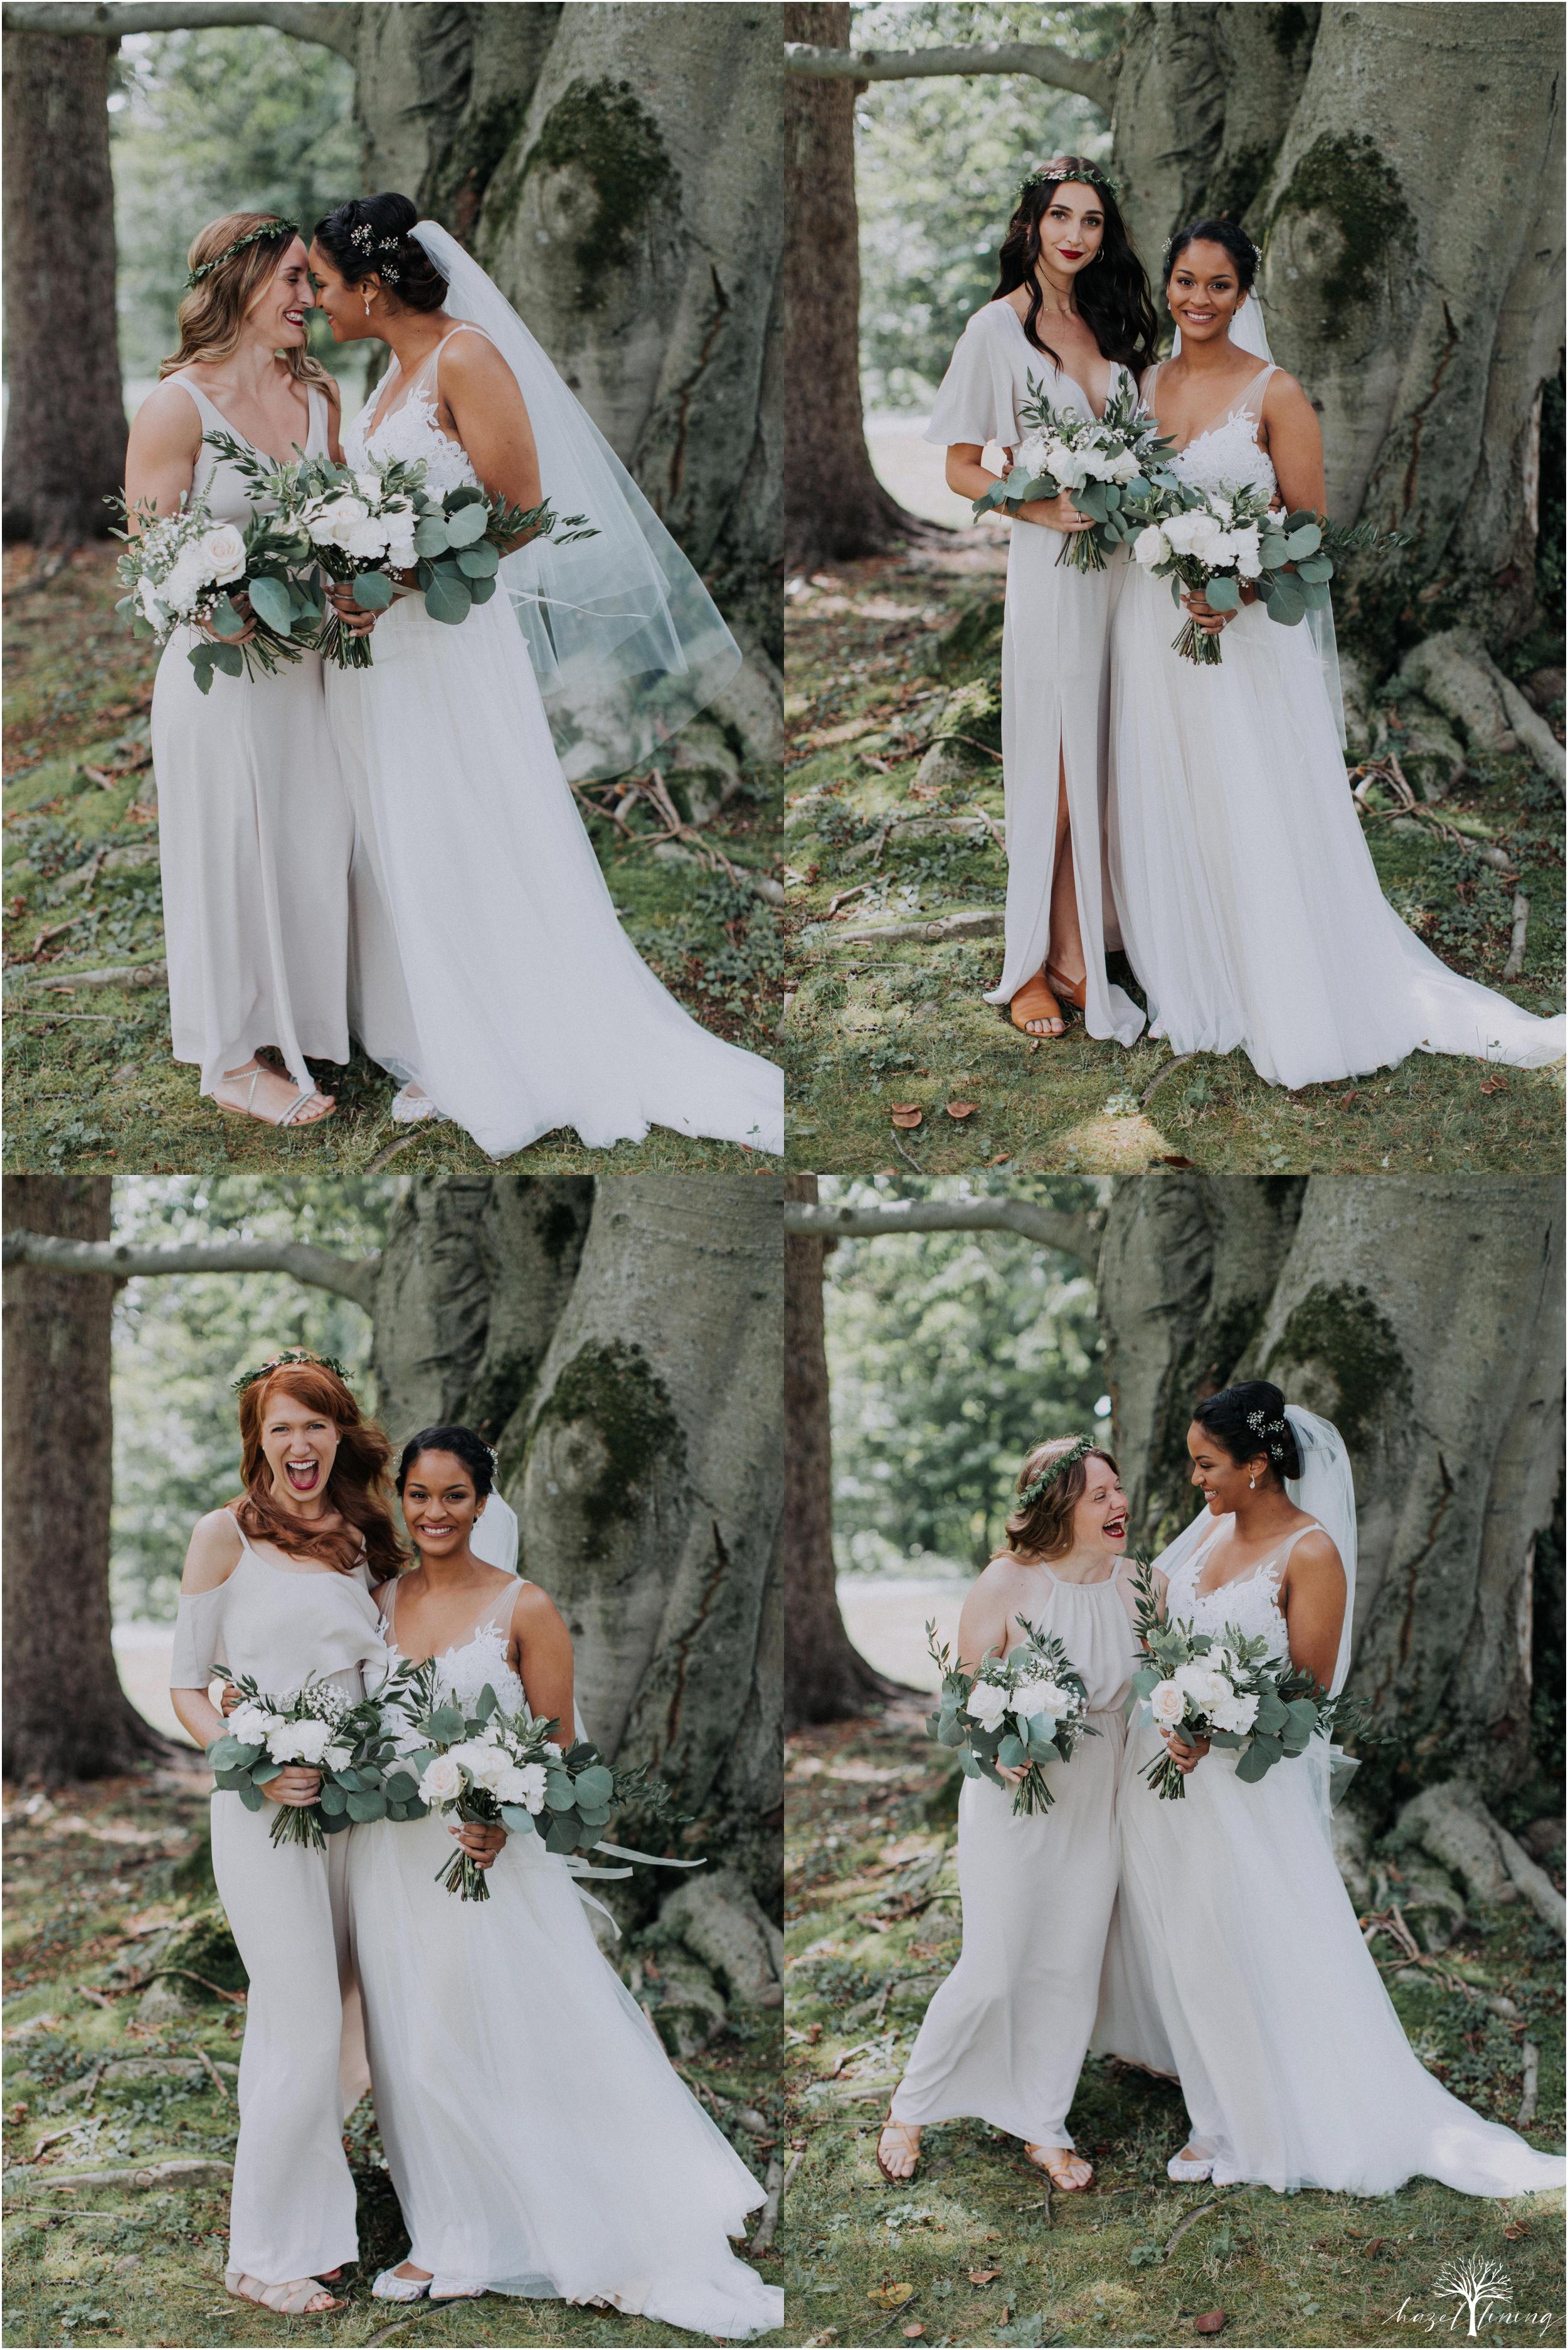 mariah-kreyling-samuel-sherratt-sherrattwiththeworld-peirce-farm-at-witch-hill-boston-massachusetts-wedding-photography-hazel-lining-travel-wedding-elopement-photography_0039.jpg